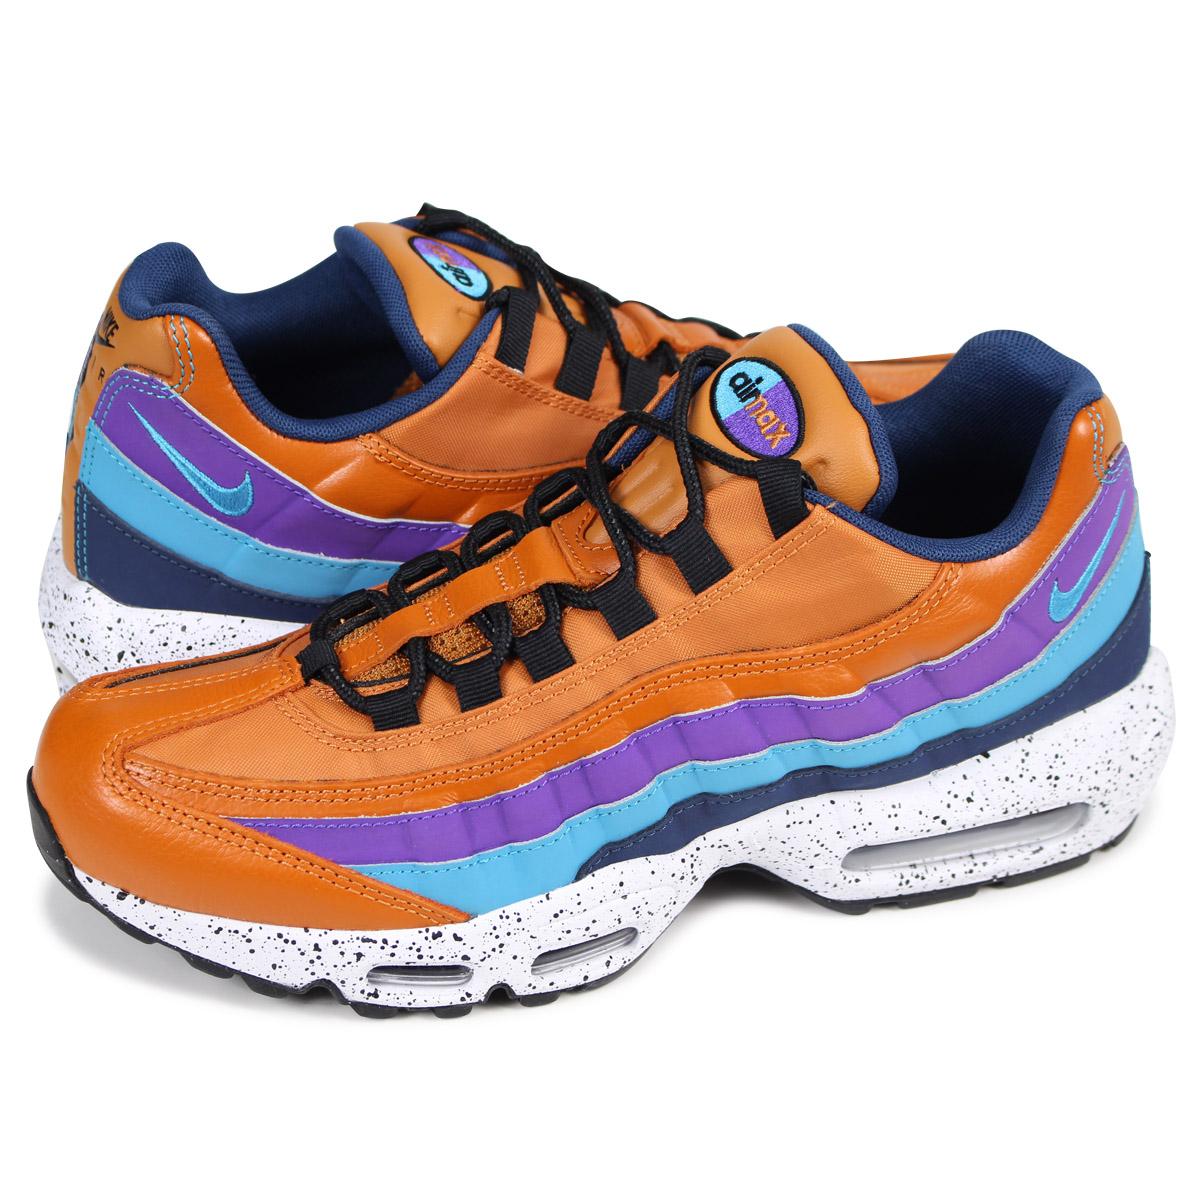 discount sale low price sale usa cheap sale NIKE AIR MAX 95 PREMIUM Kie Ney AMAX 95 premium sneakers men 538,416-800  orange [2/17 Shinnyu load]